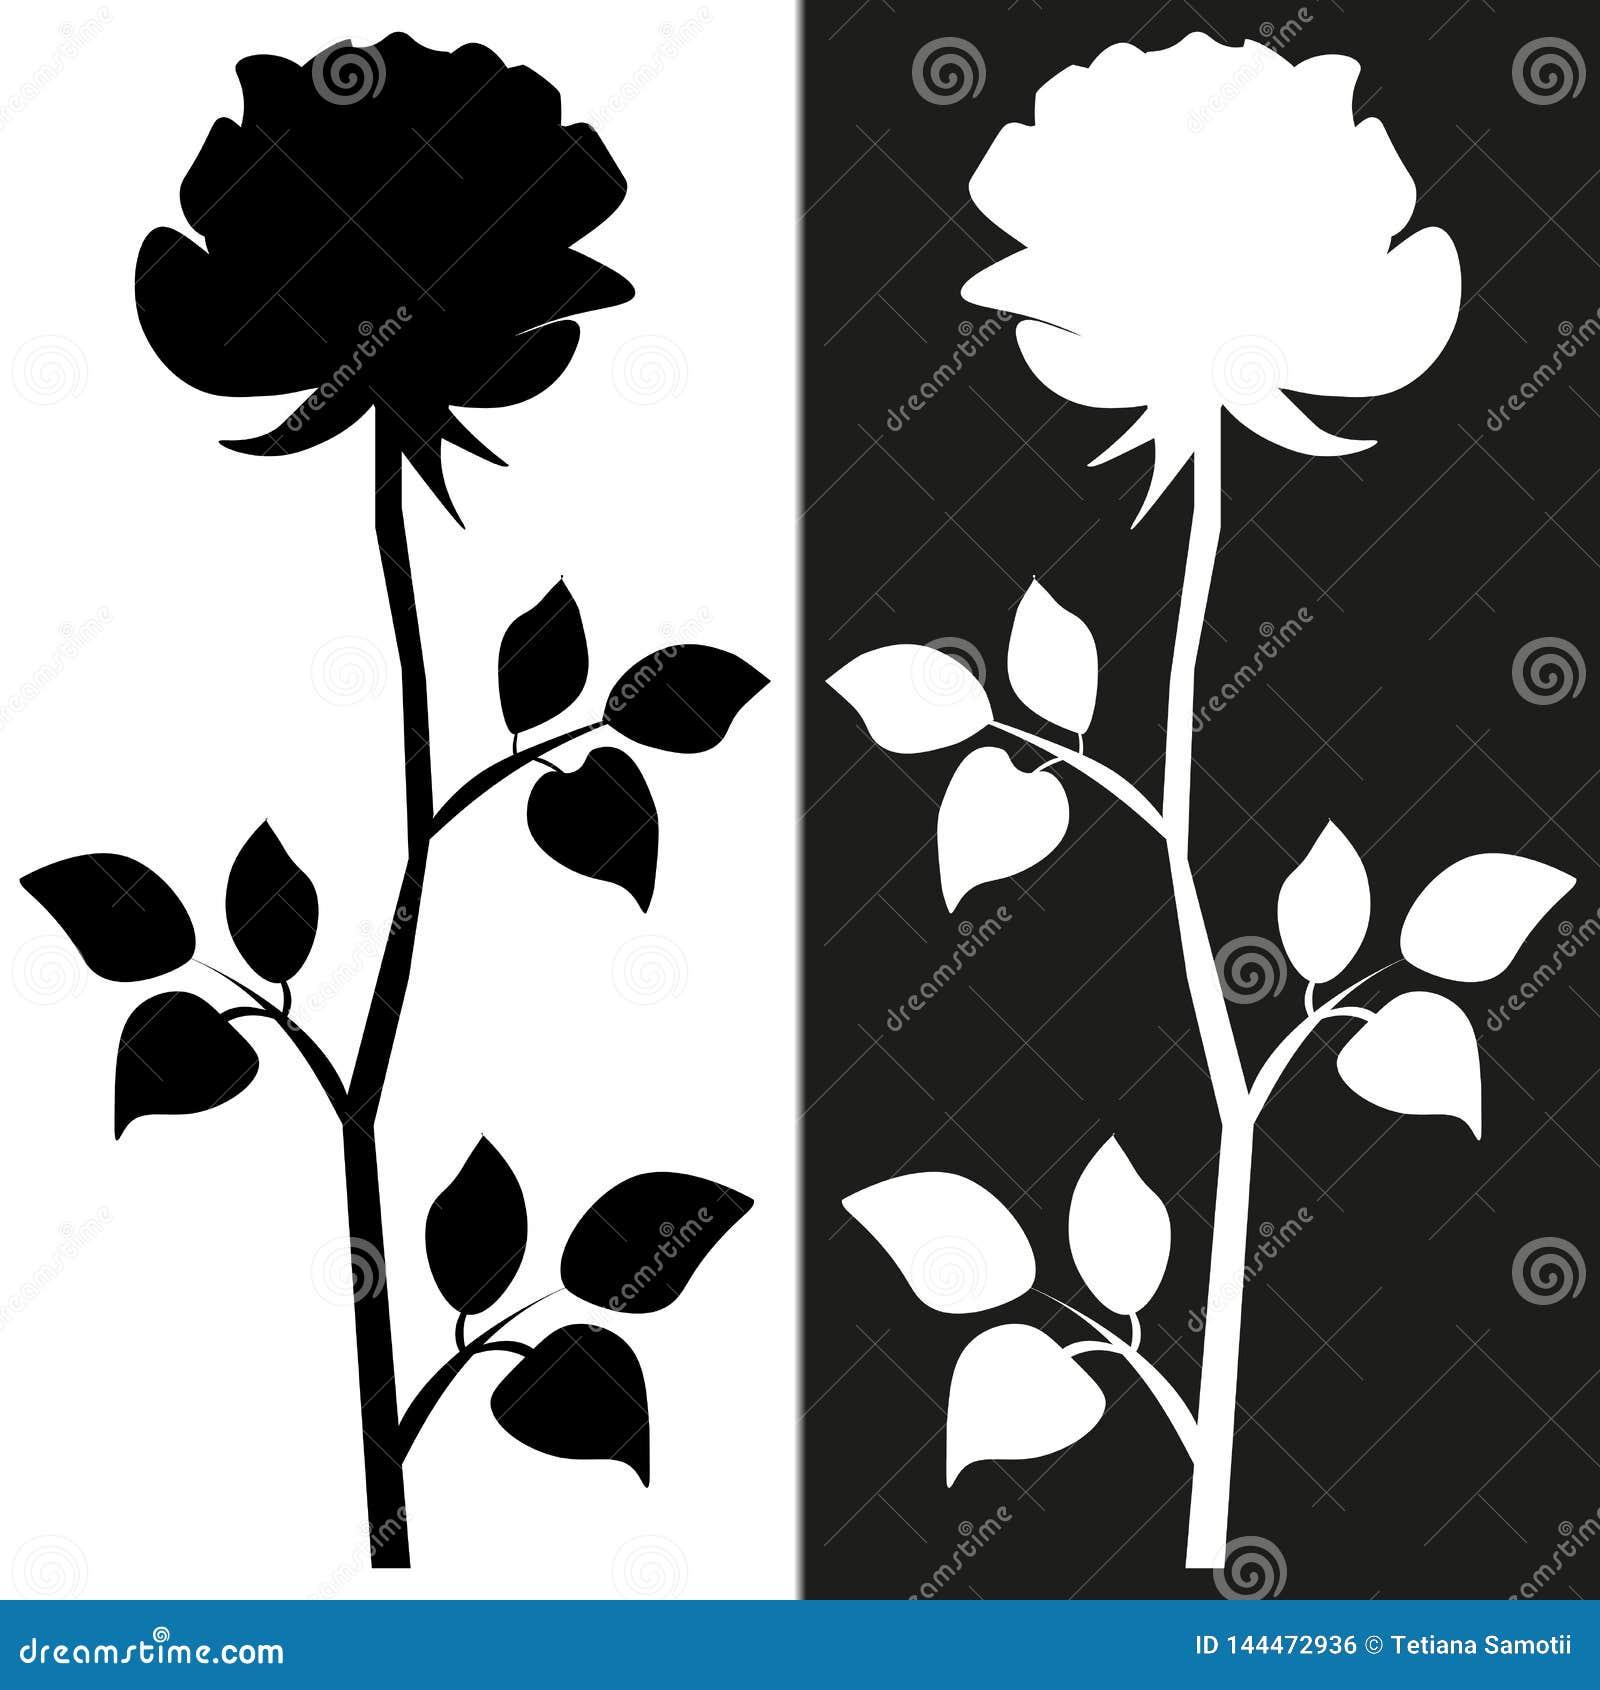 O Σκίτσο μοτίβου λουλουδιών για το σχέδιο Η μαύρη σκιαγραφία αυξήθηκε με τα φύλλα